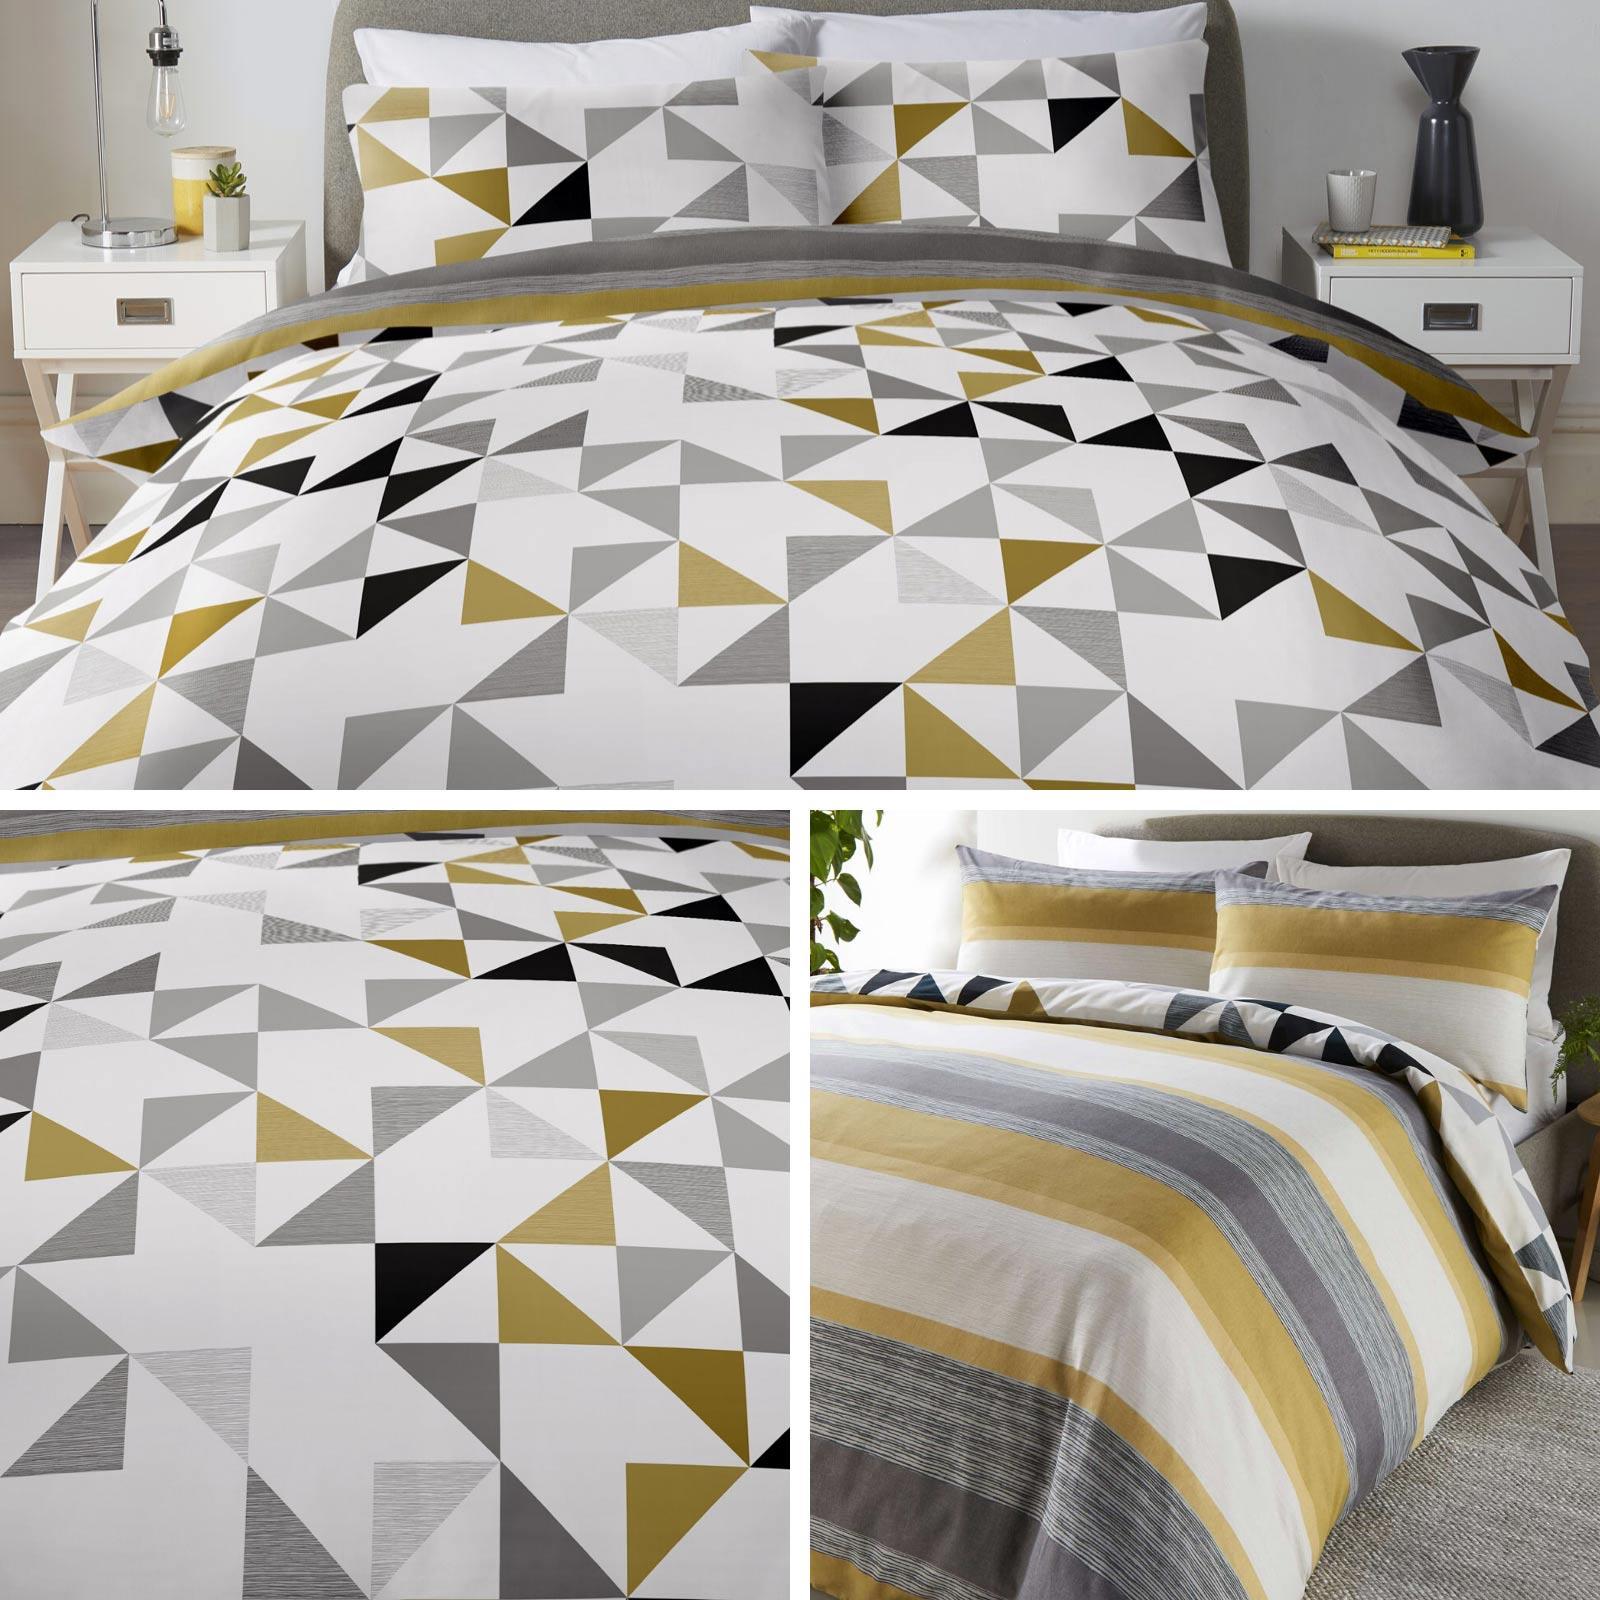 Contemporary Stripes Duvet Cover Sets Quilt Cover Sets Reversible Bedding Sets